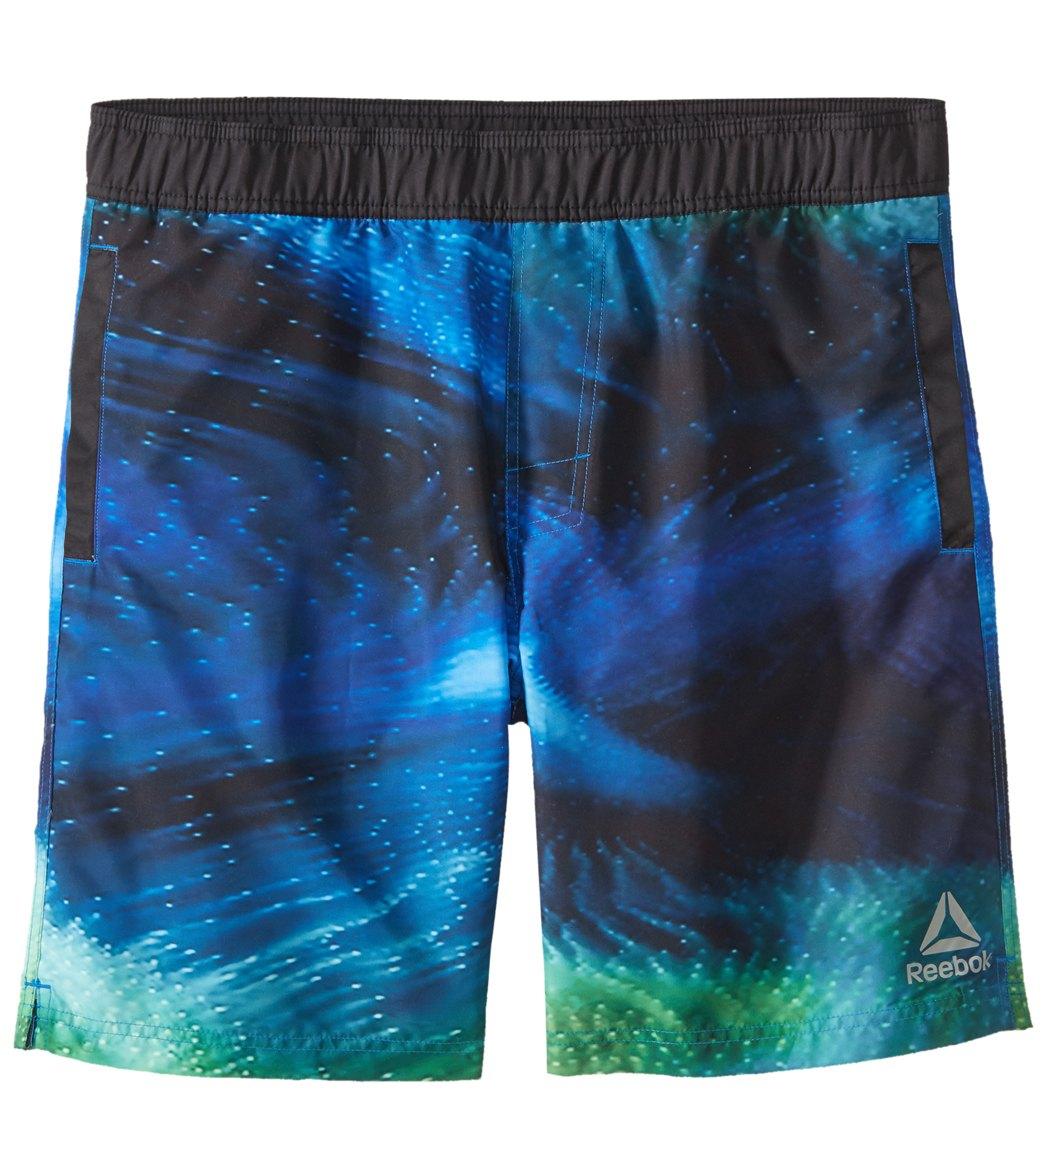 8a98dbd5fb11d Reebok Men's Deep Sea 8 inch Volley at SwimOutlet.com - Free Shipping